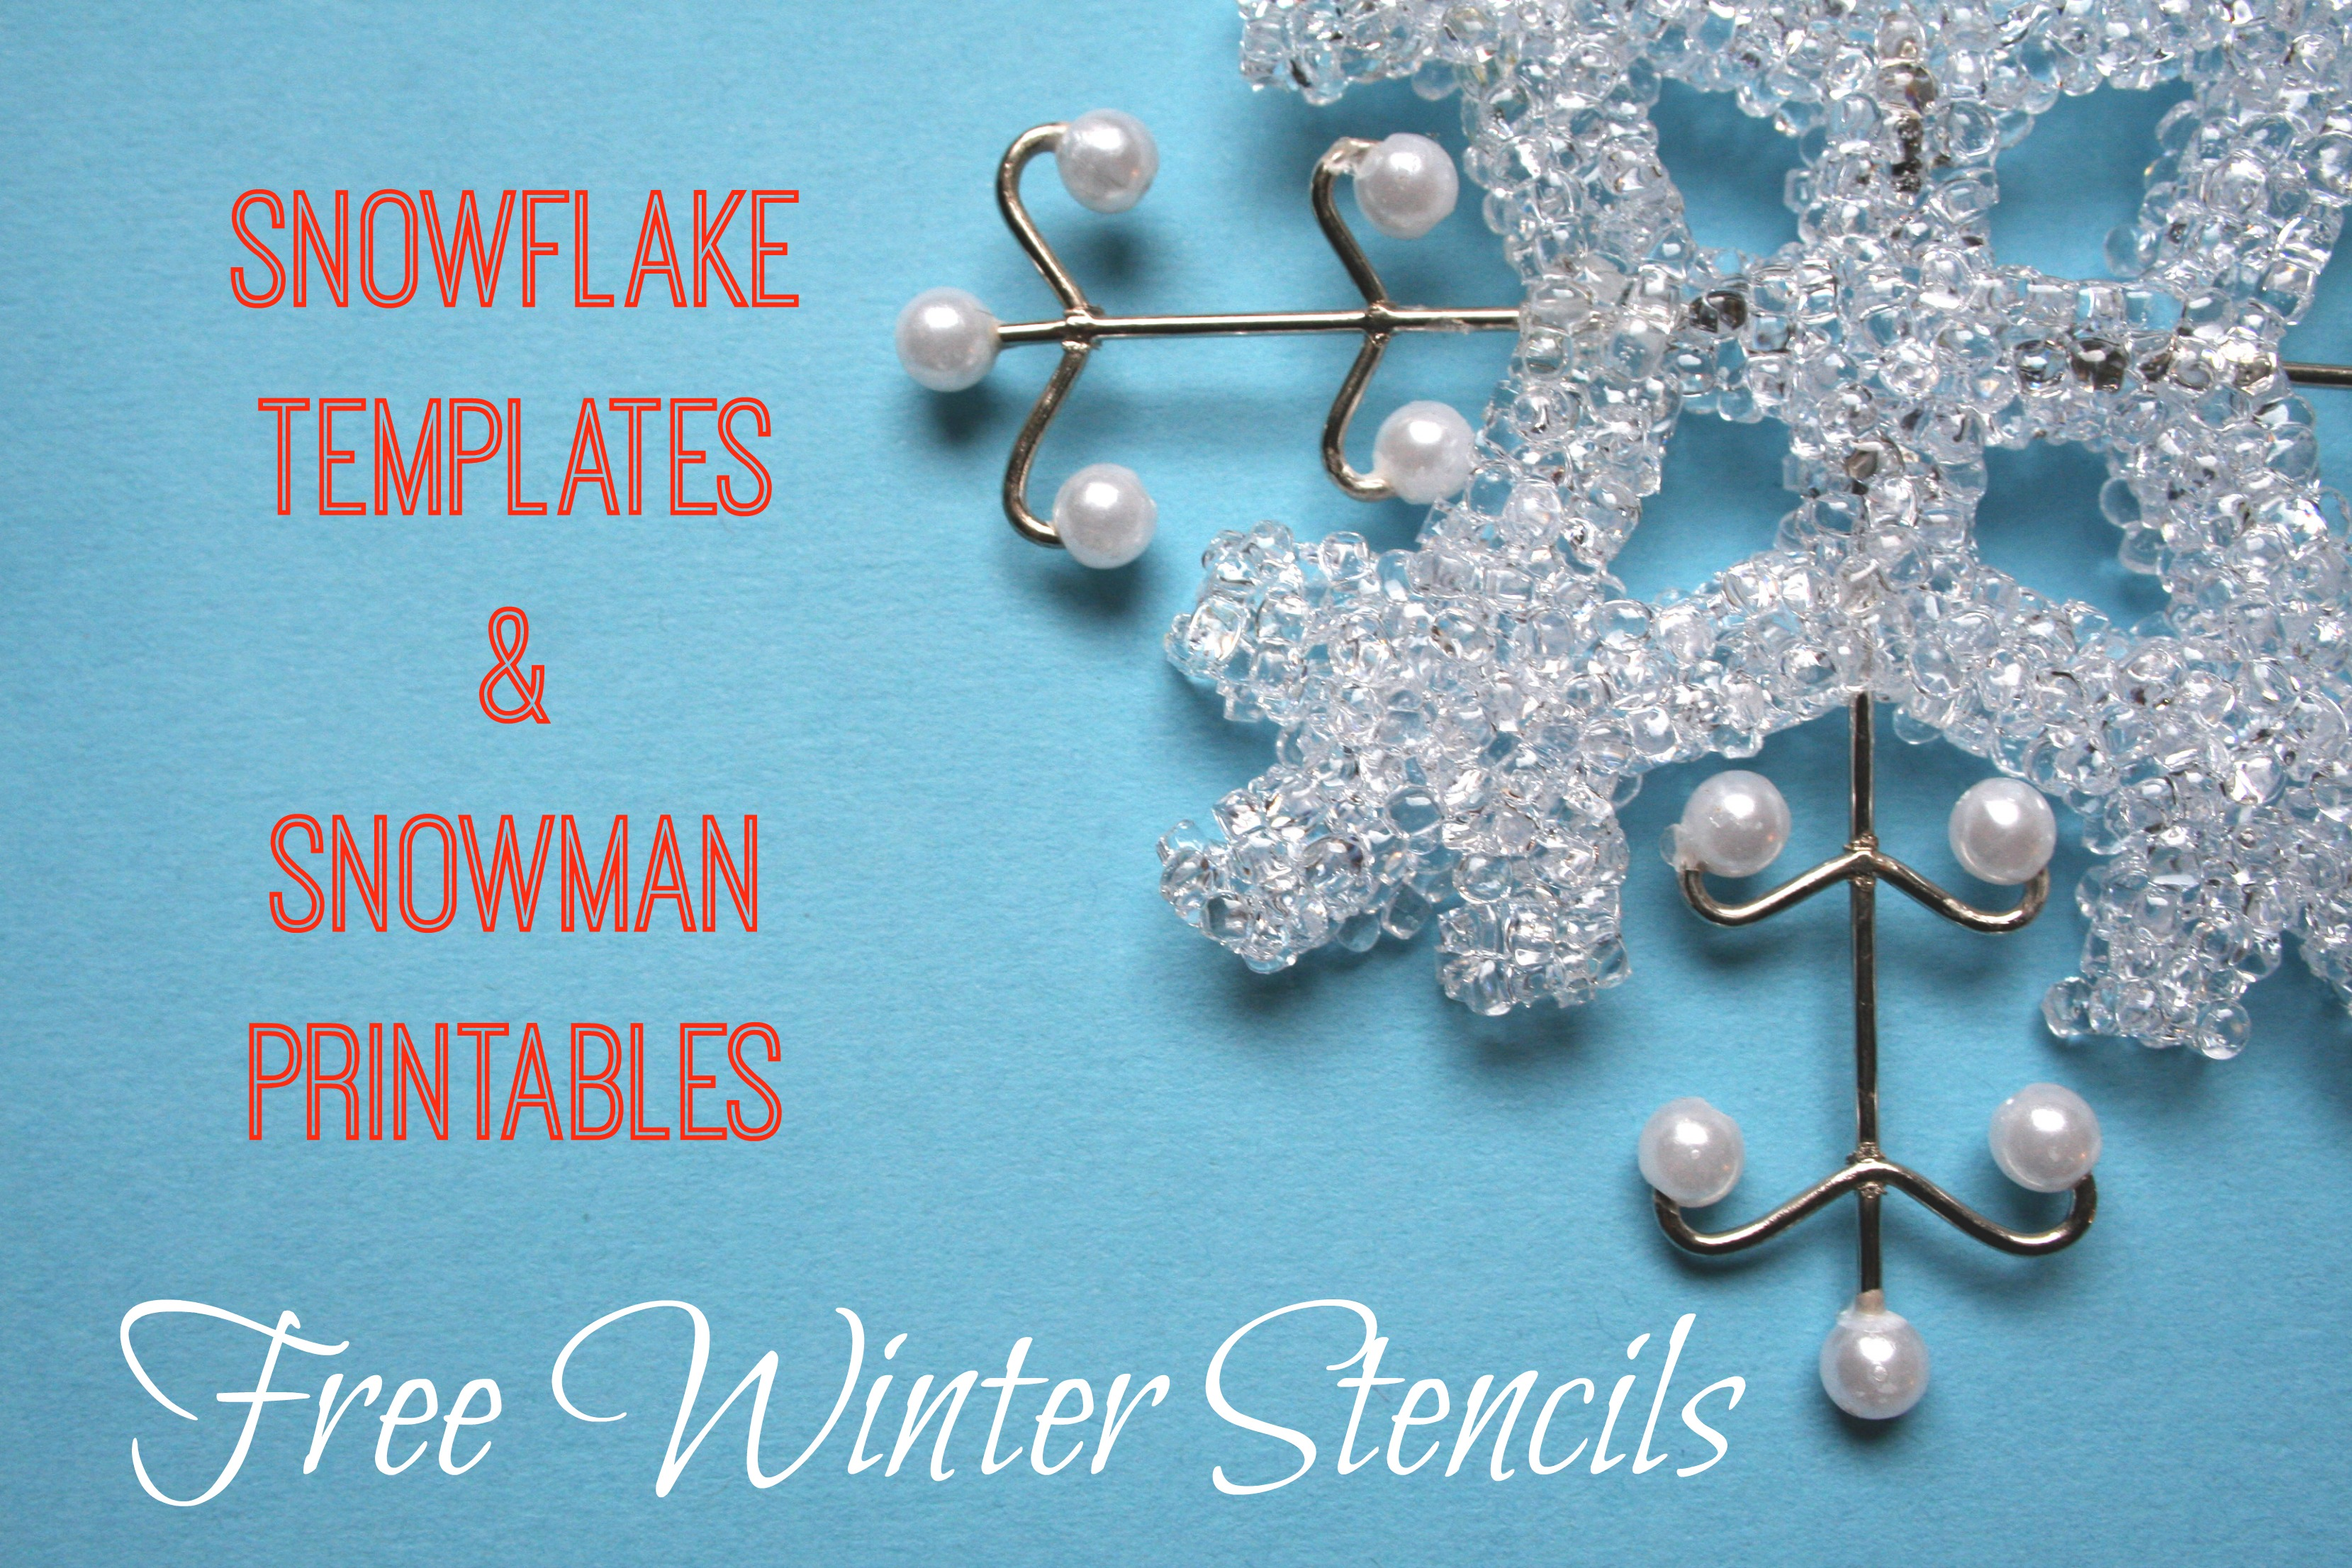 Free Winter Stencils Printable Snowflake Snowman Templates Patterns